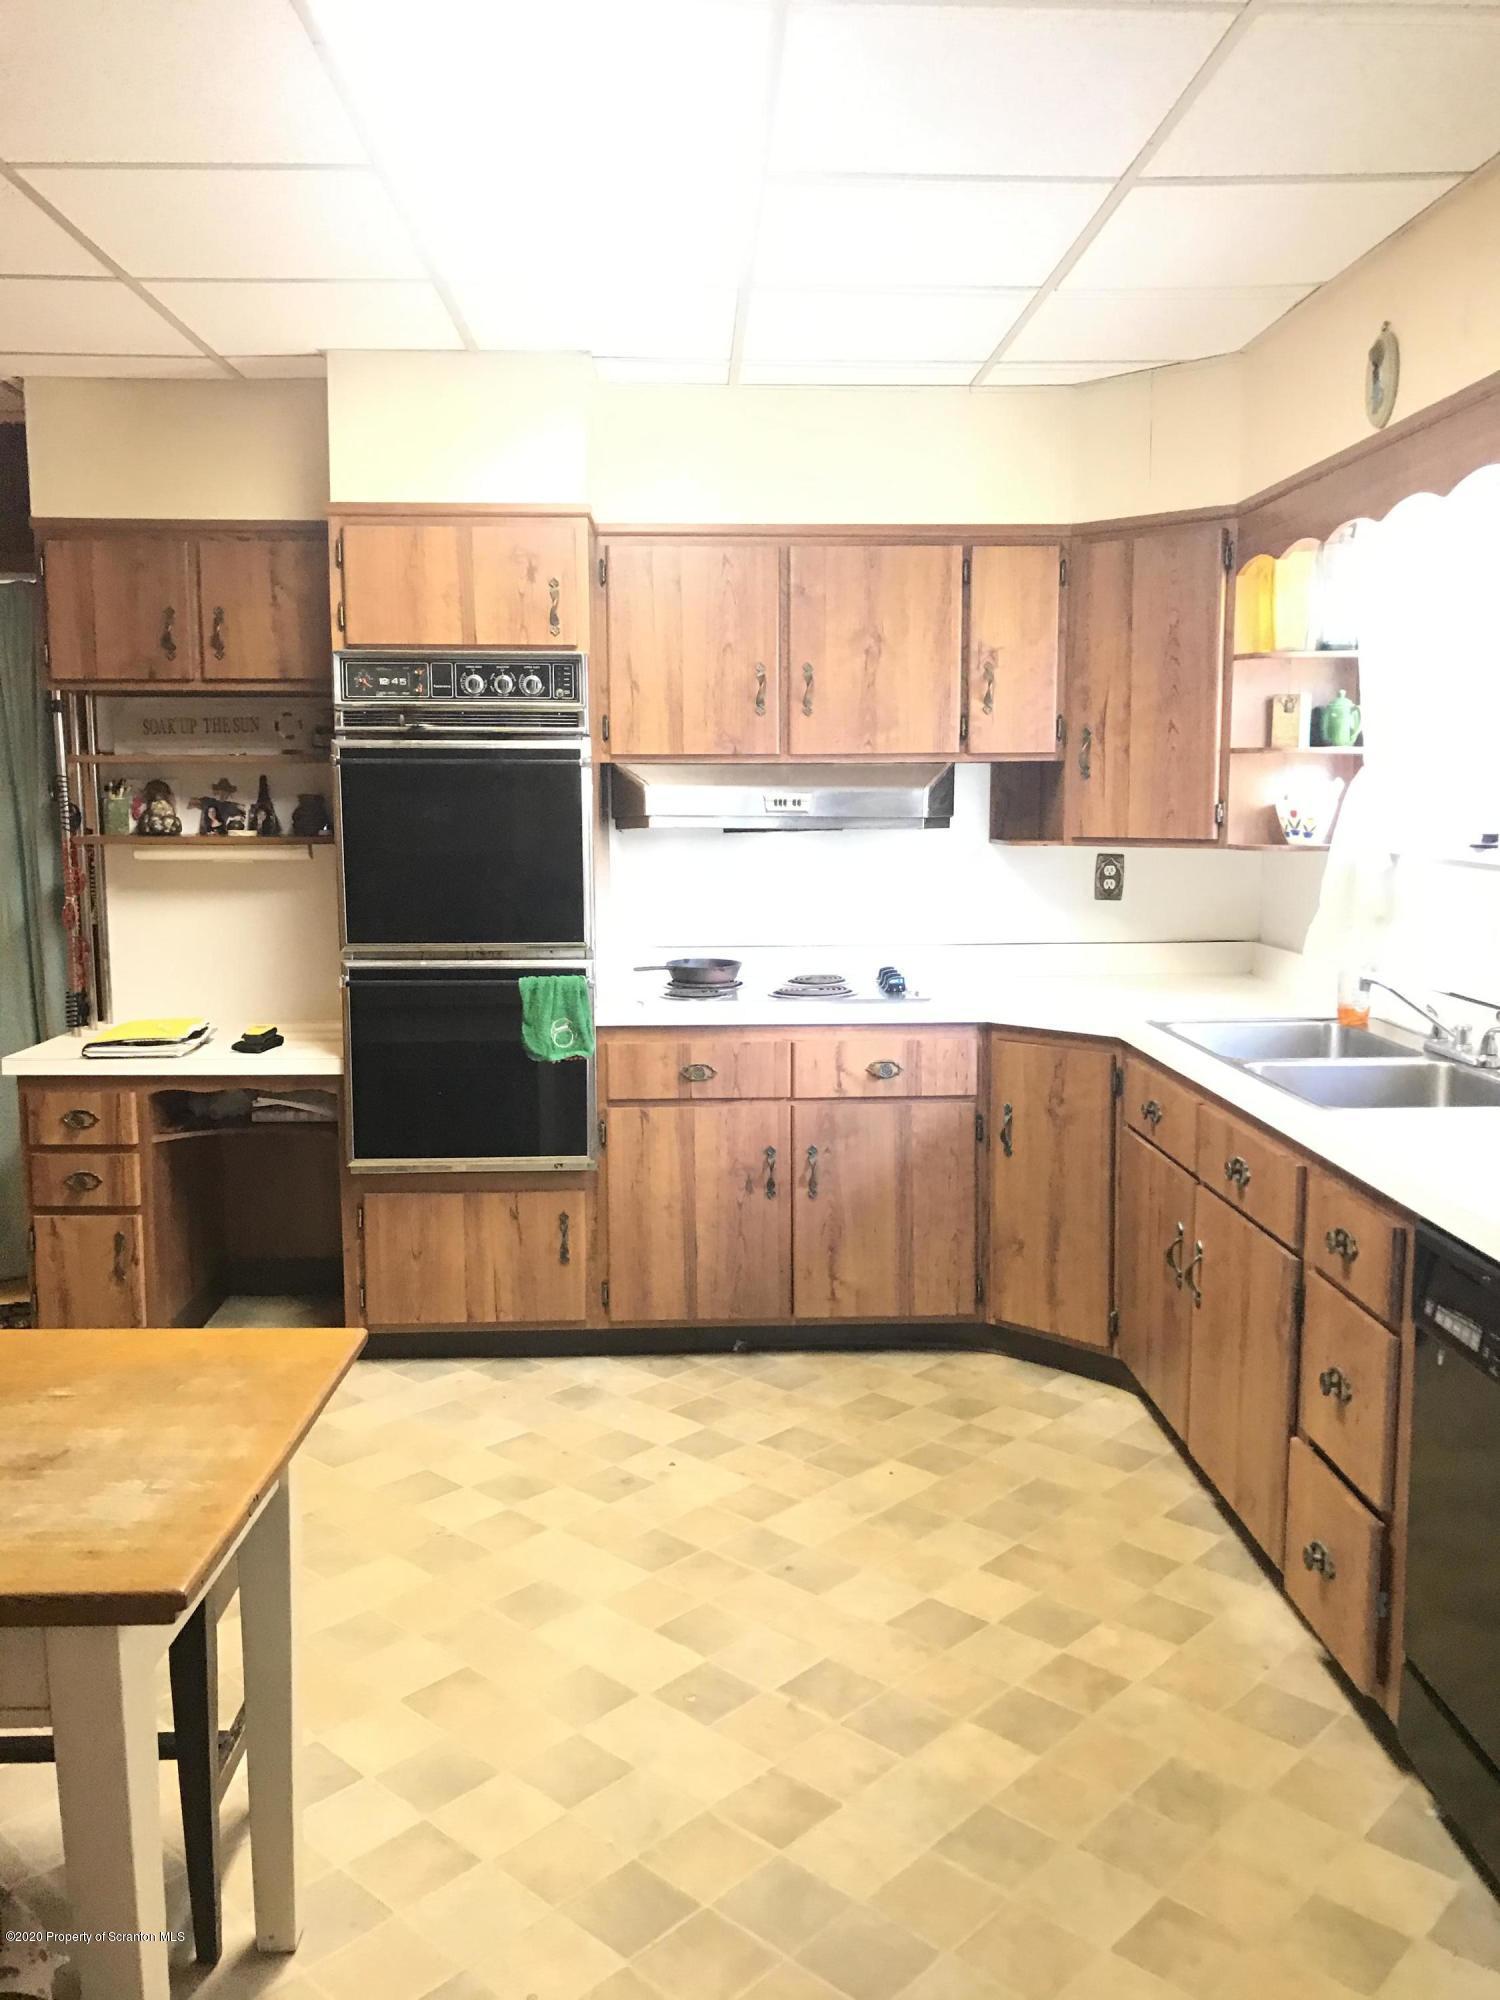 615-617 Sumner Ave, Scranton, Pennsylvania 18504, ,Multi-Family,For Sale,Sumner,20-4271